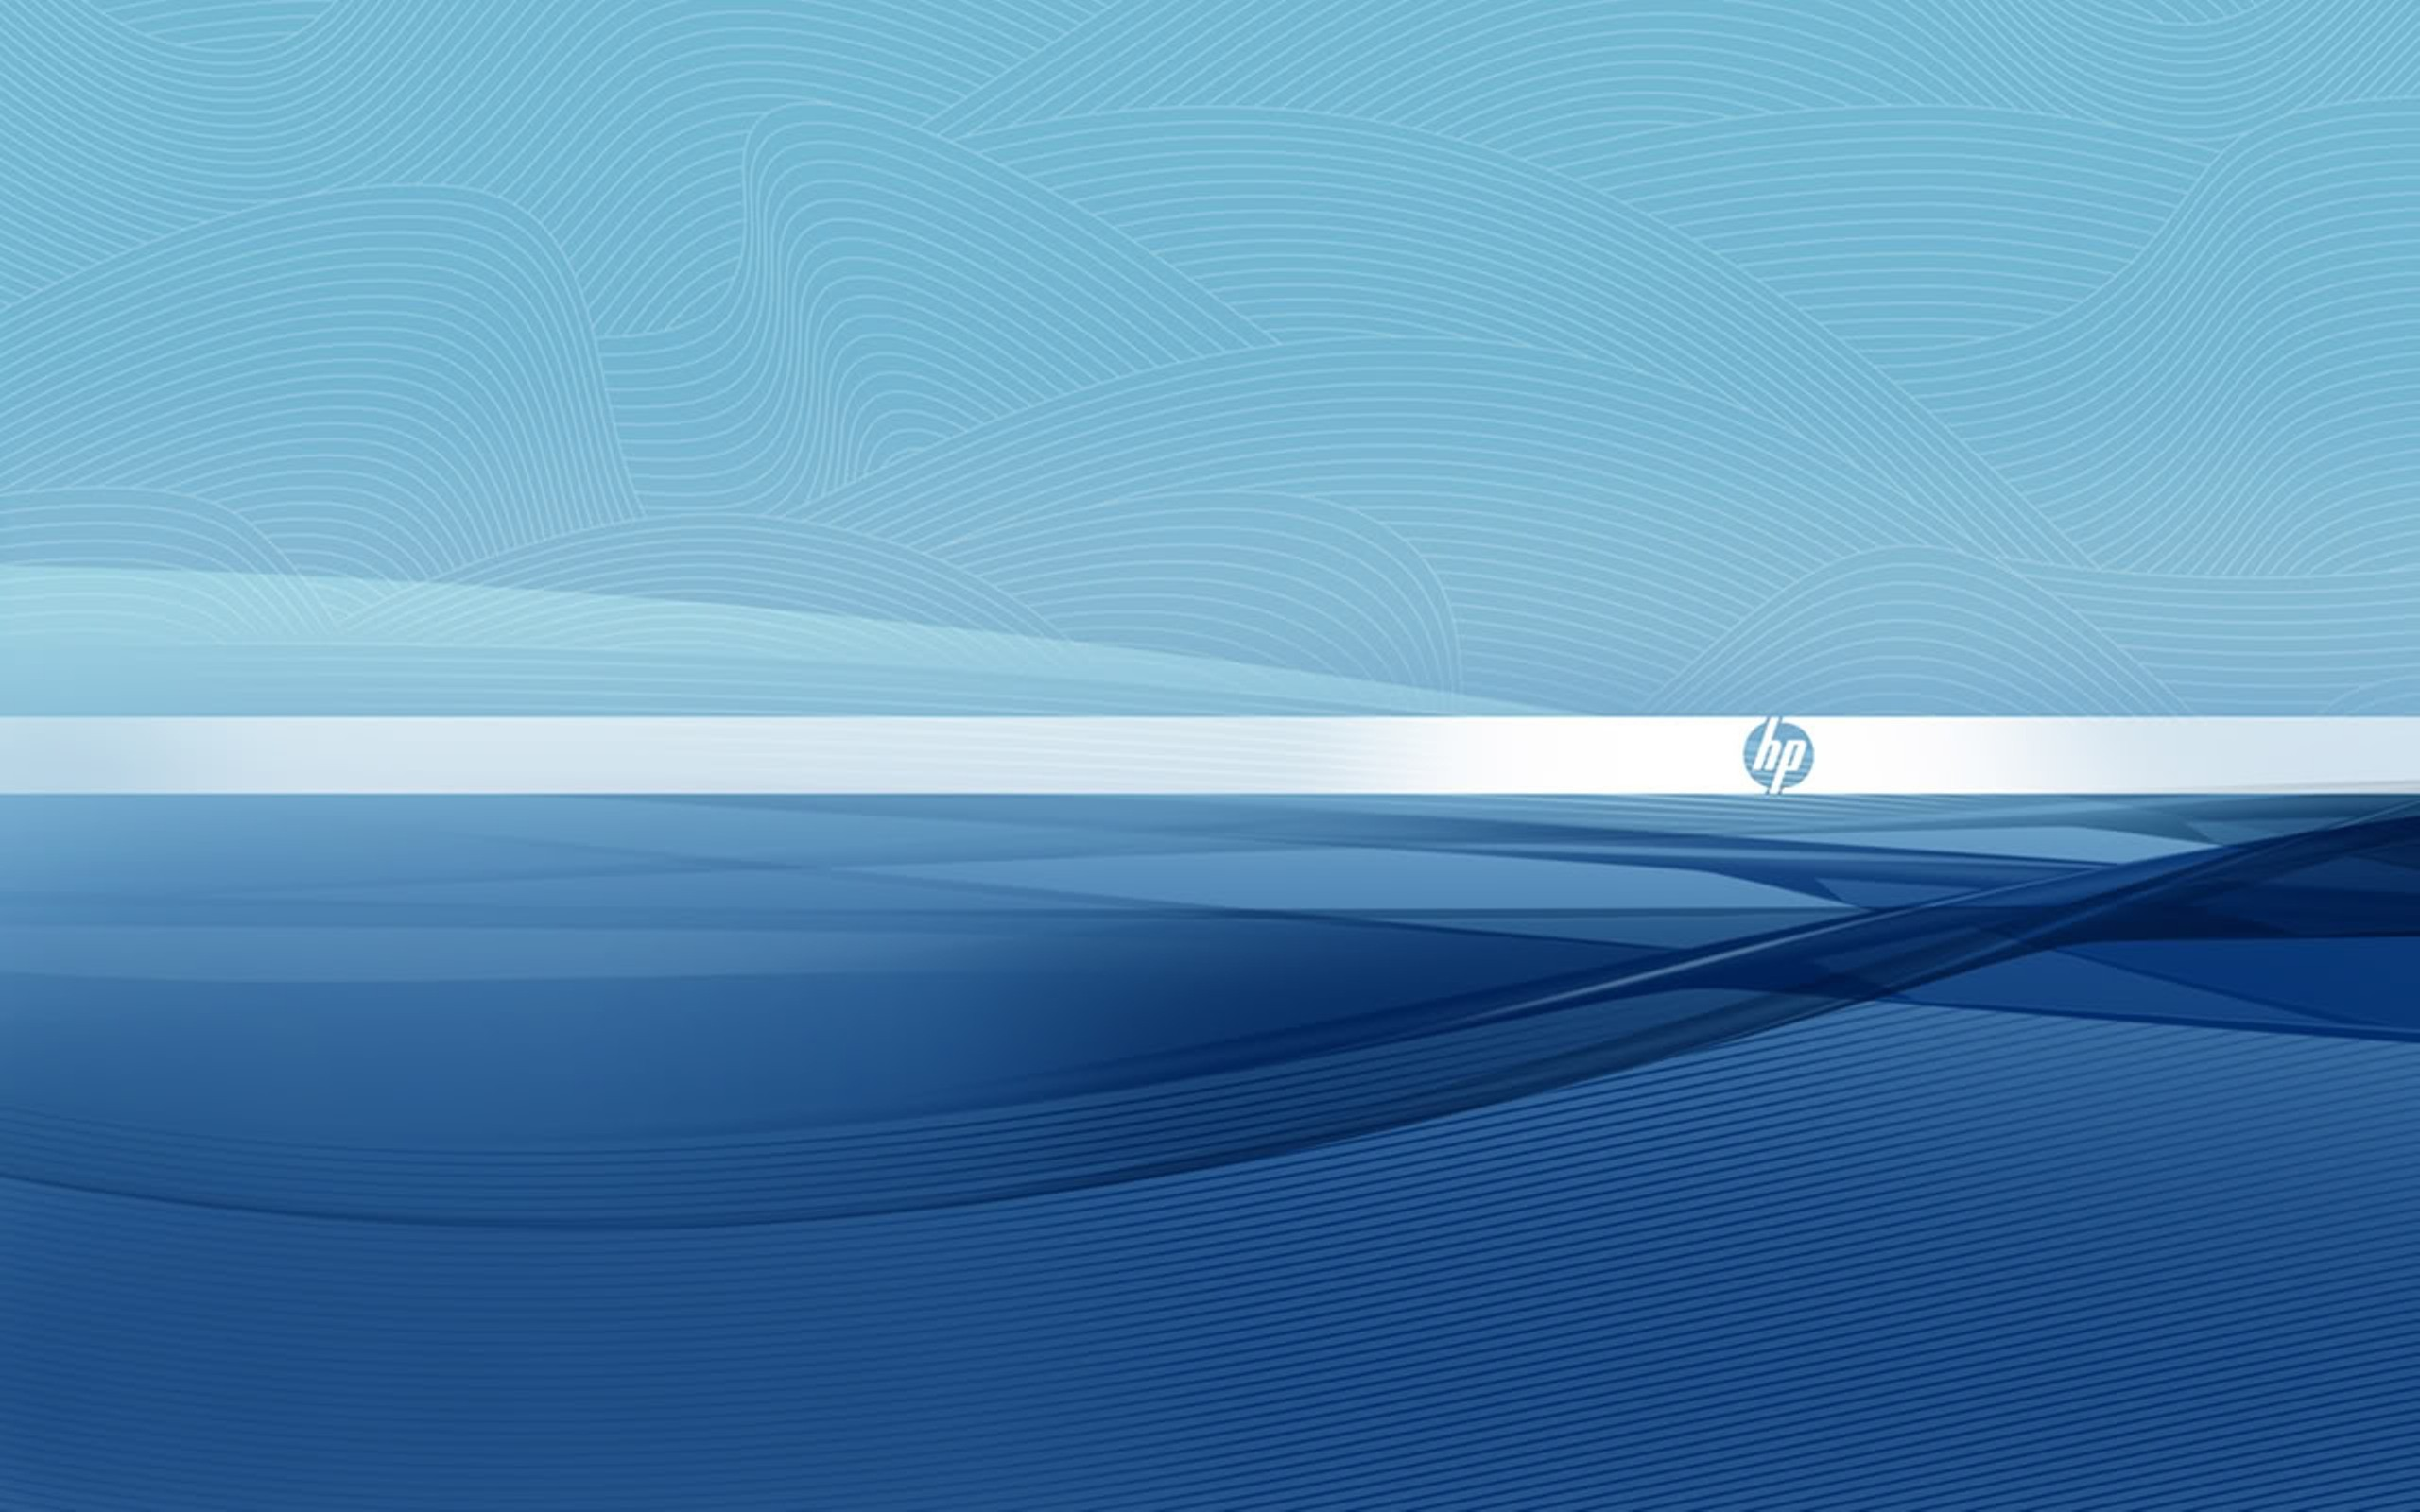 hp wallpaper ·① download free beautiful full hd wallpapers for